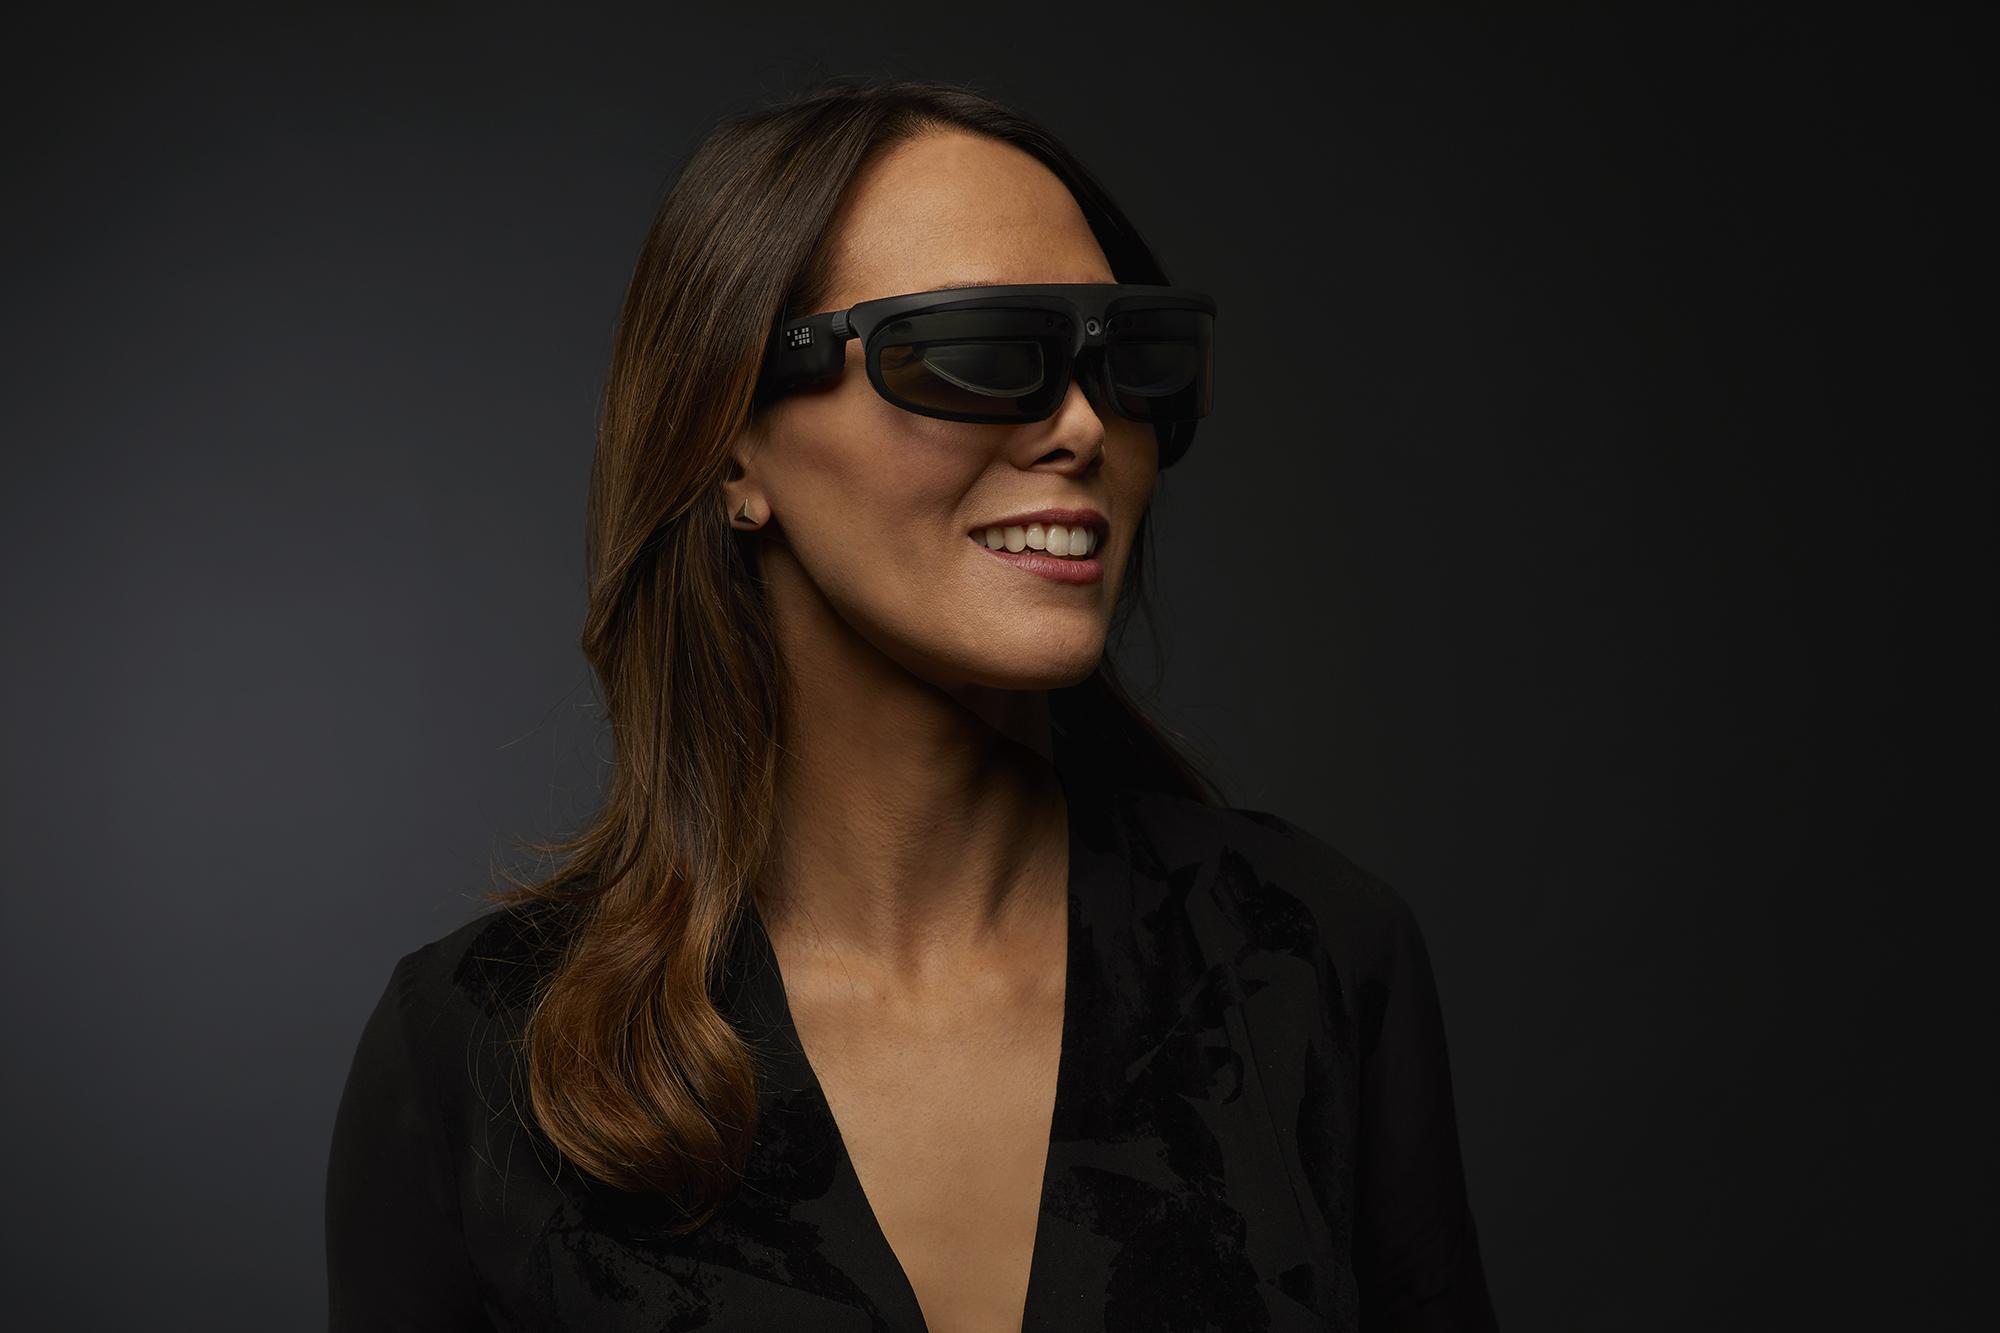 ODG R-8 Smartglasses on Female (Photo: Business Wire)